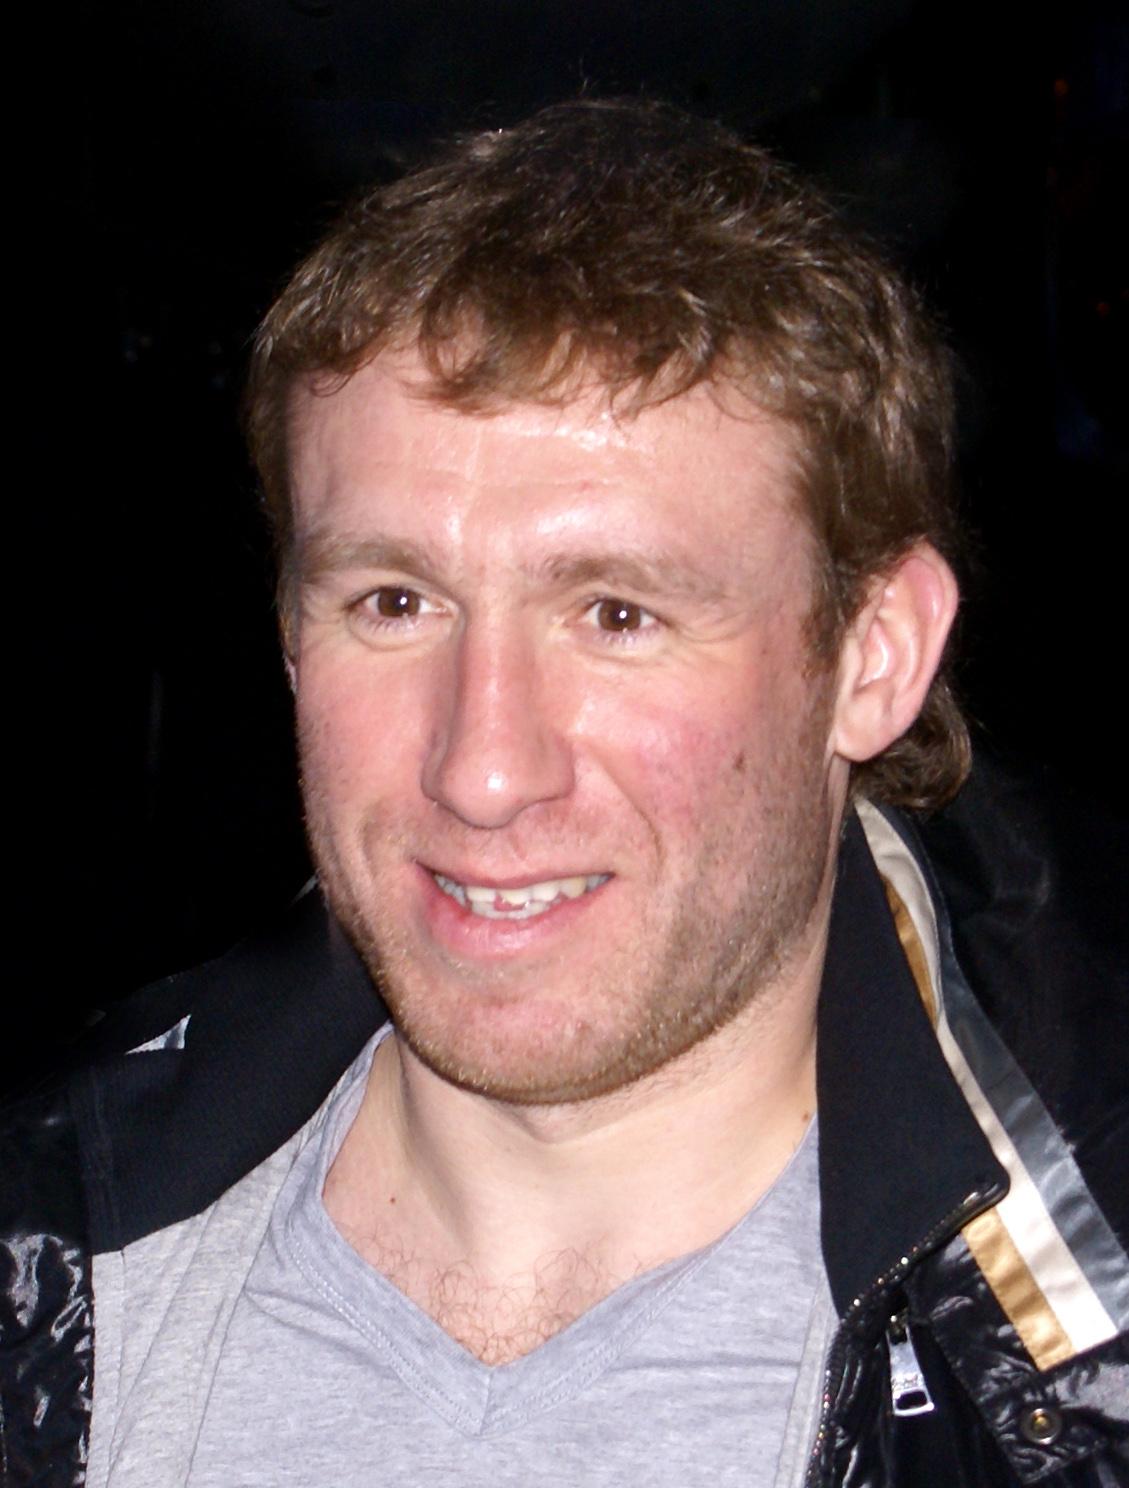 Dmitri Vlasenkov